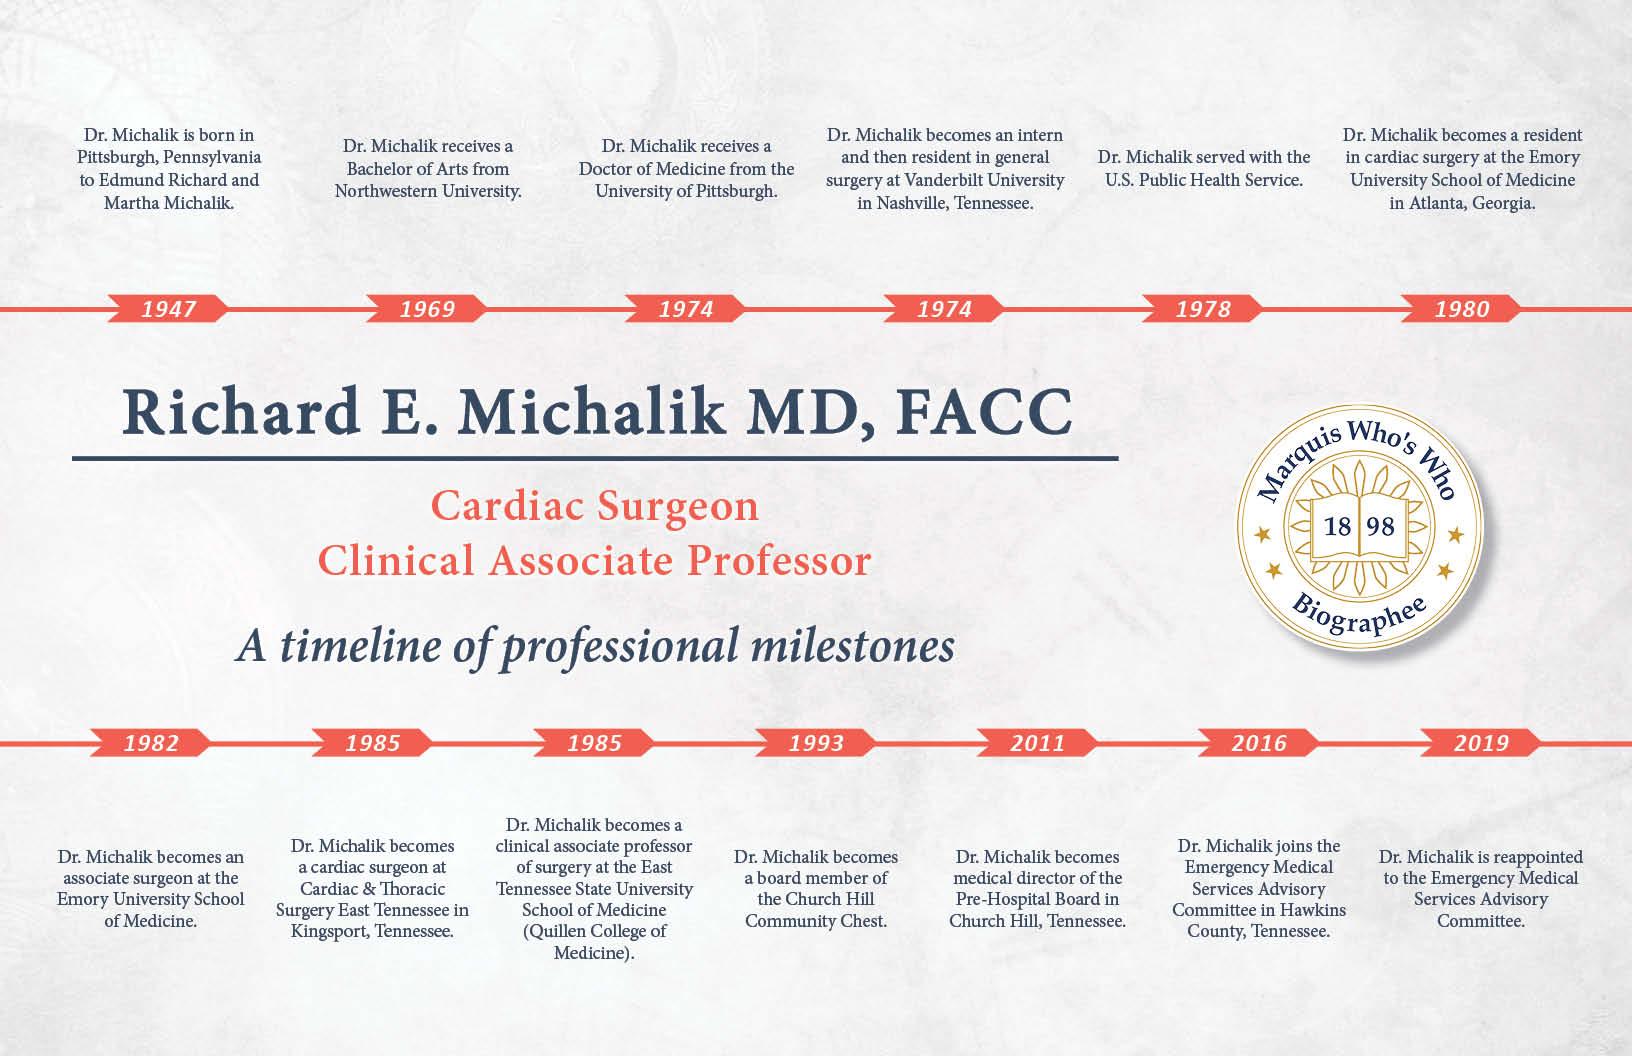 Richard Michalik Professional Milestones